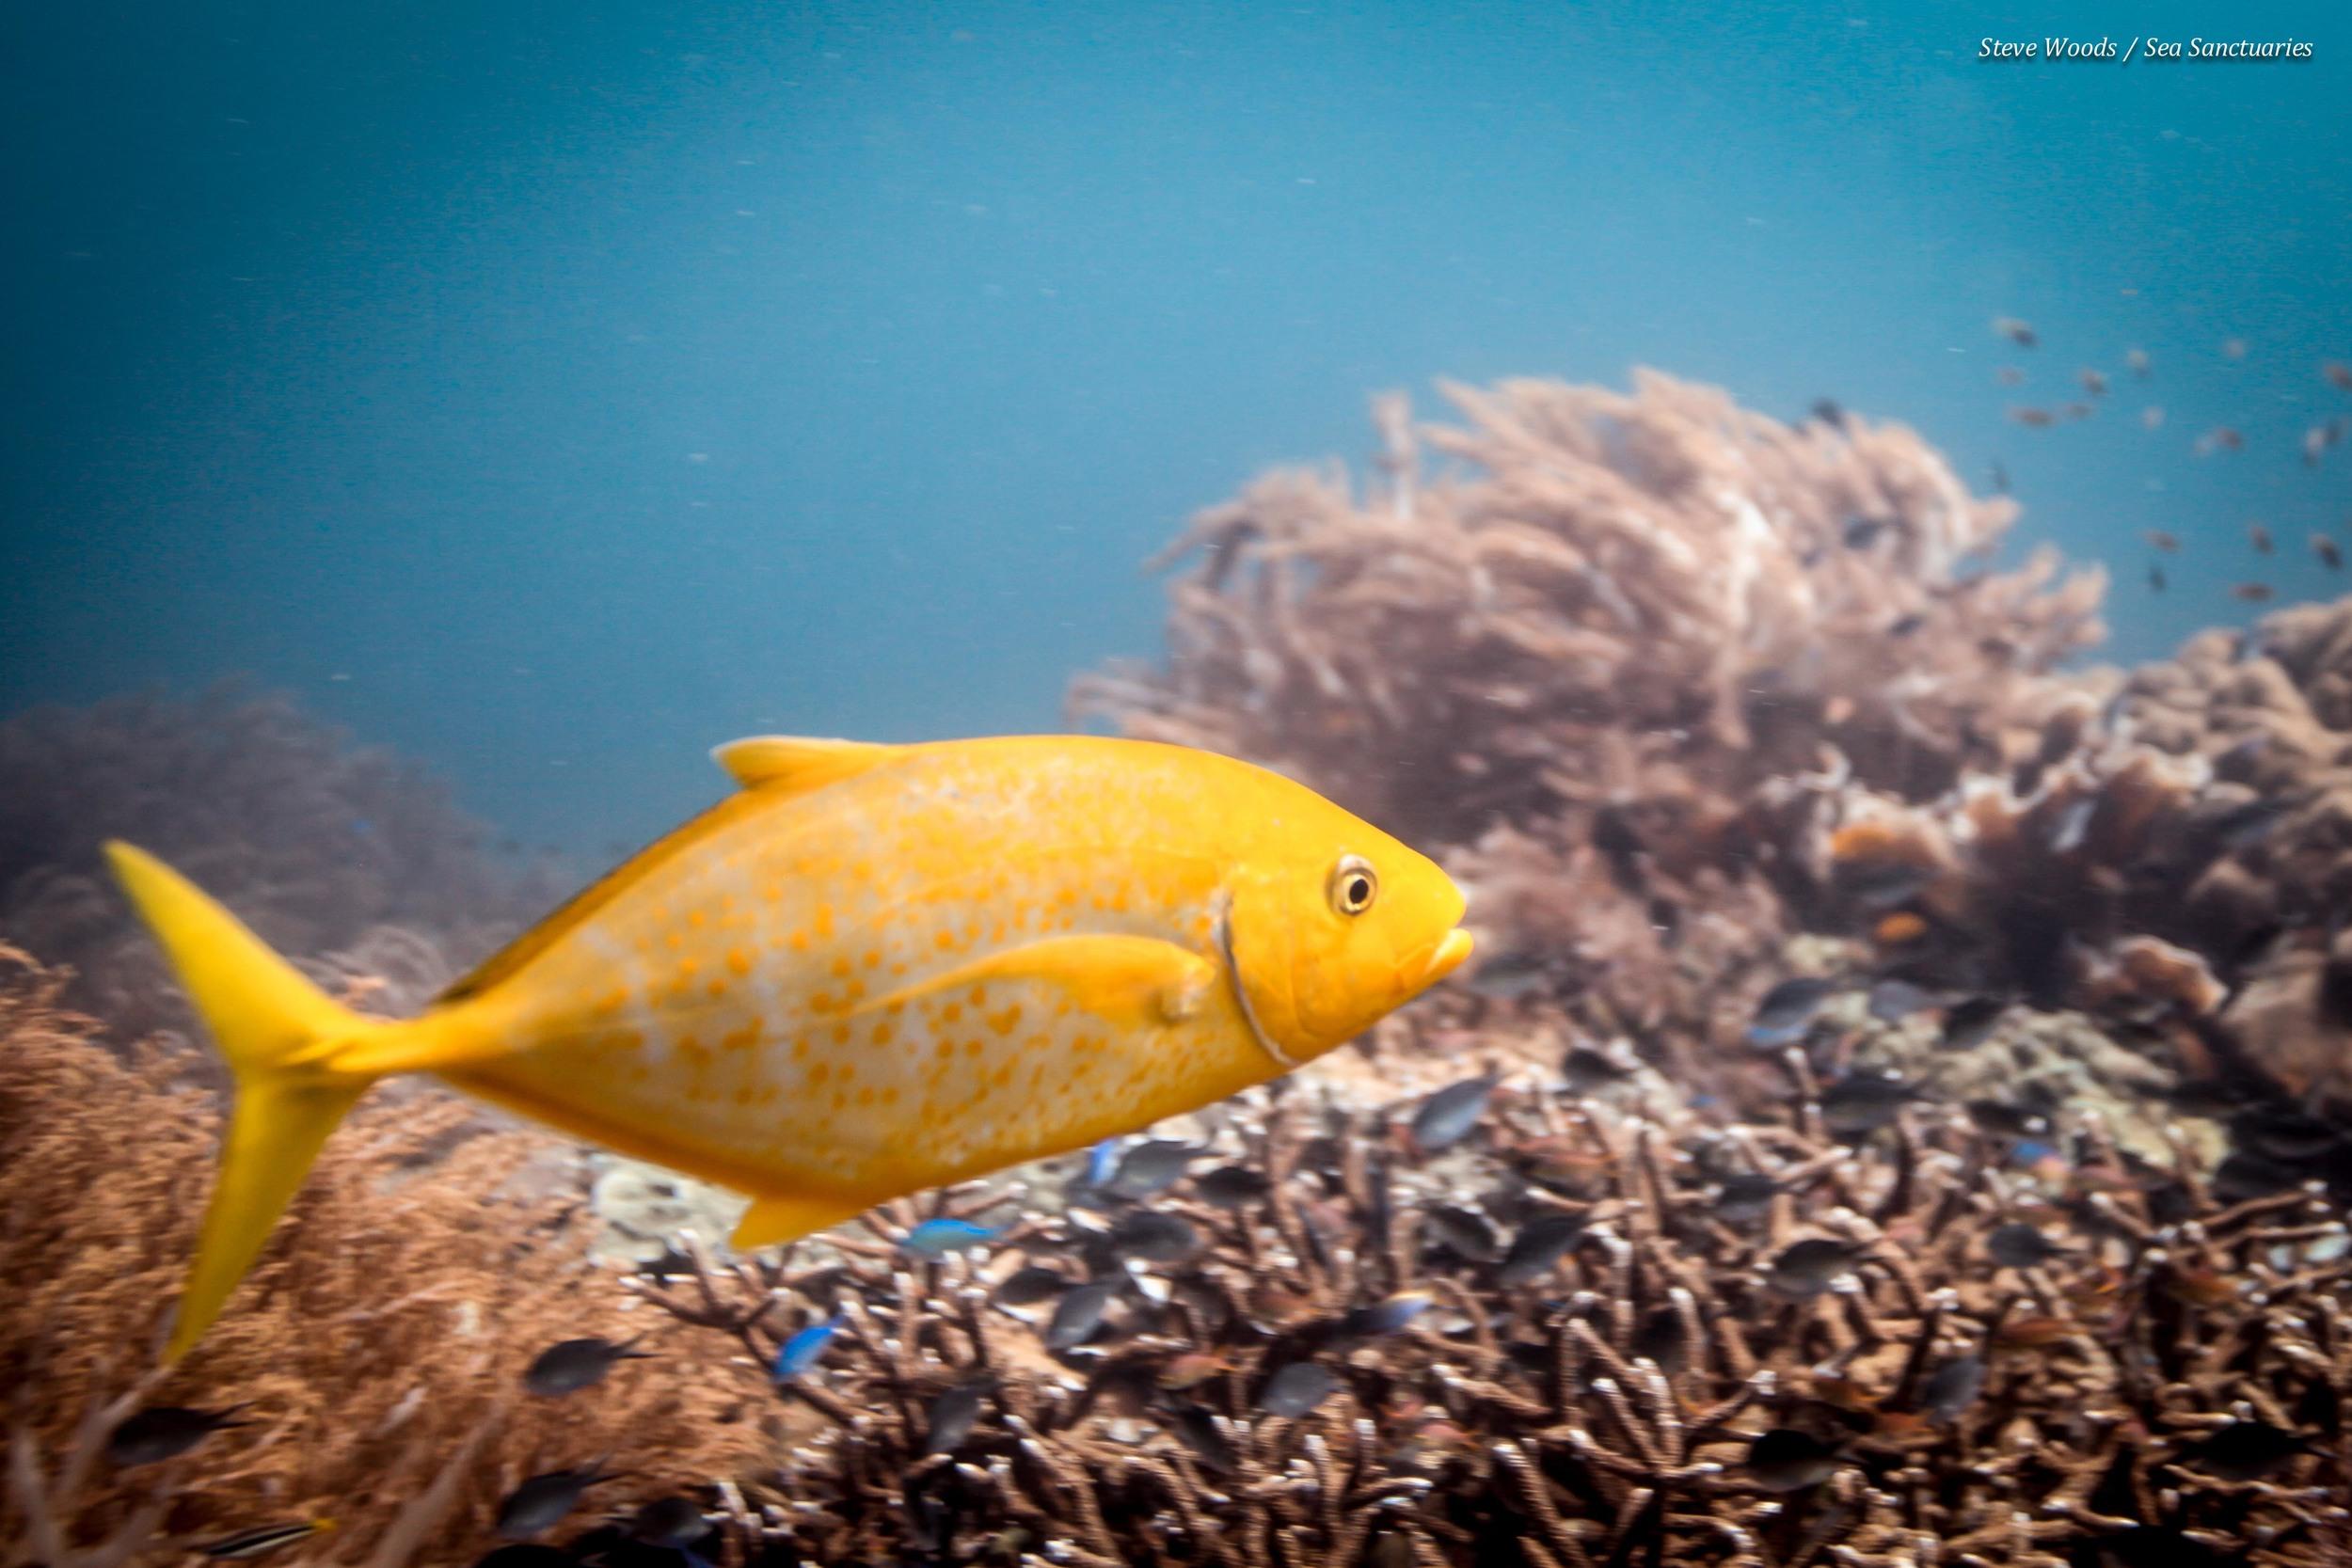 Fish ID techniques  Estimating fish sizes  Survey data collation